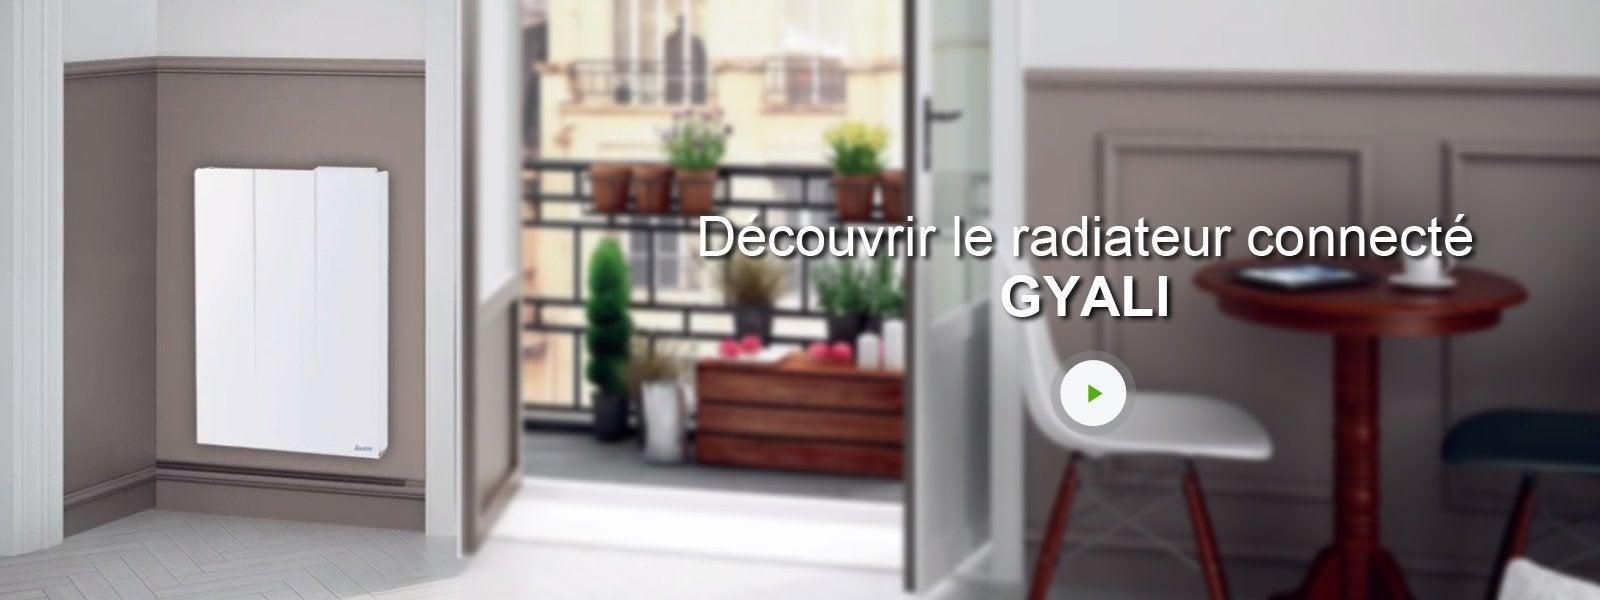 radiateur lectrique connect inertie pierre sauter gyali 1000 w leroy merlin. Black Bedroom Furniture Sets. Home Design Ideas